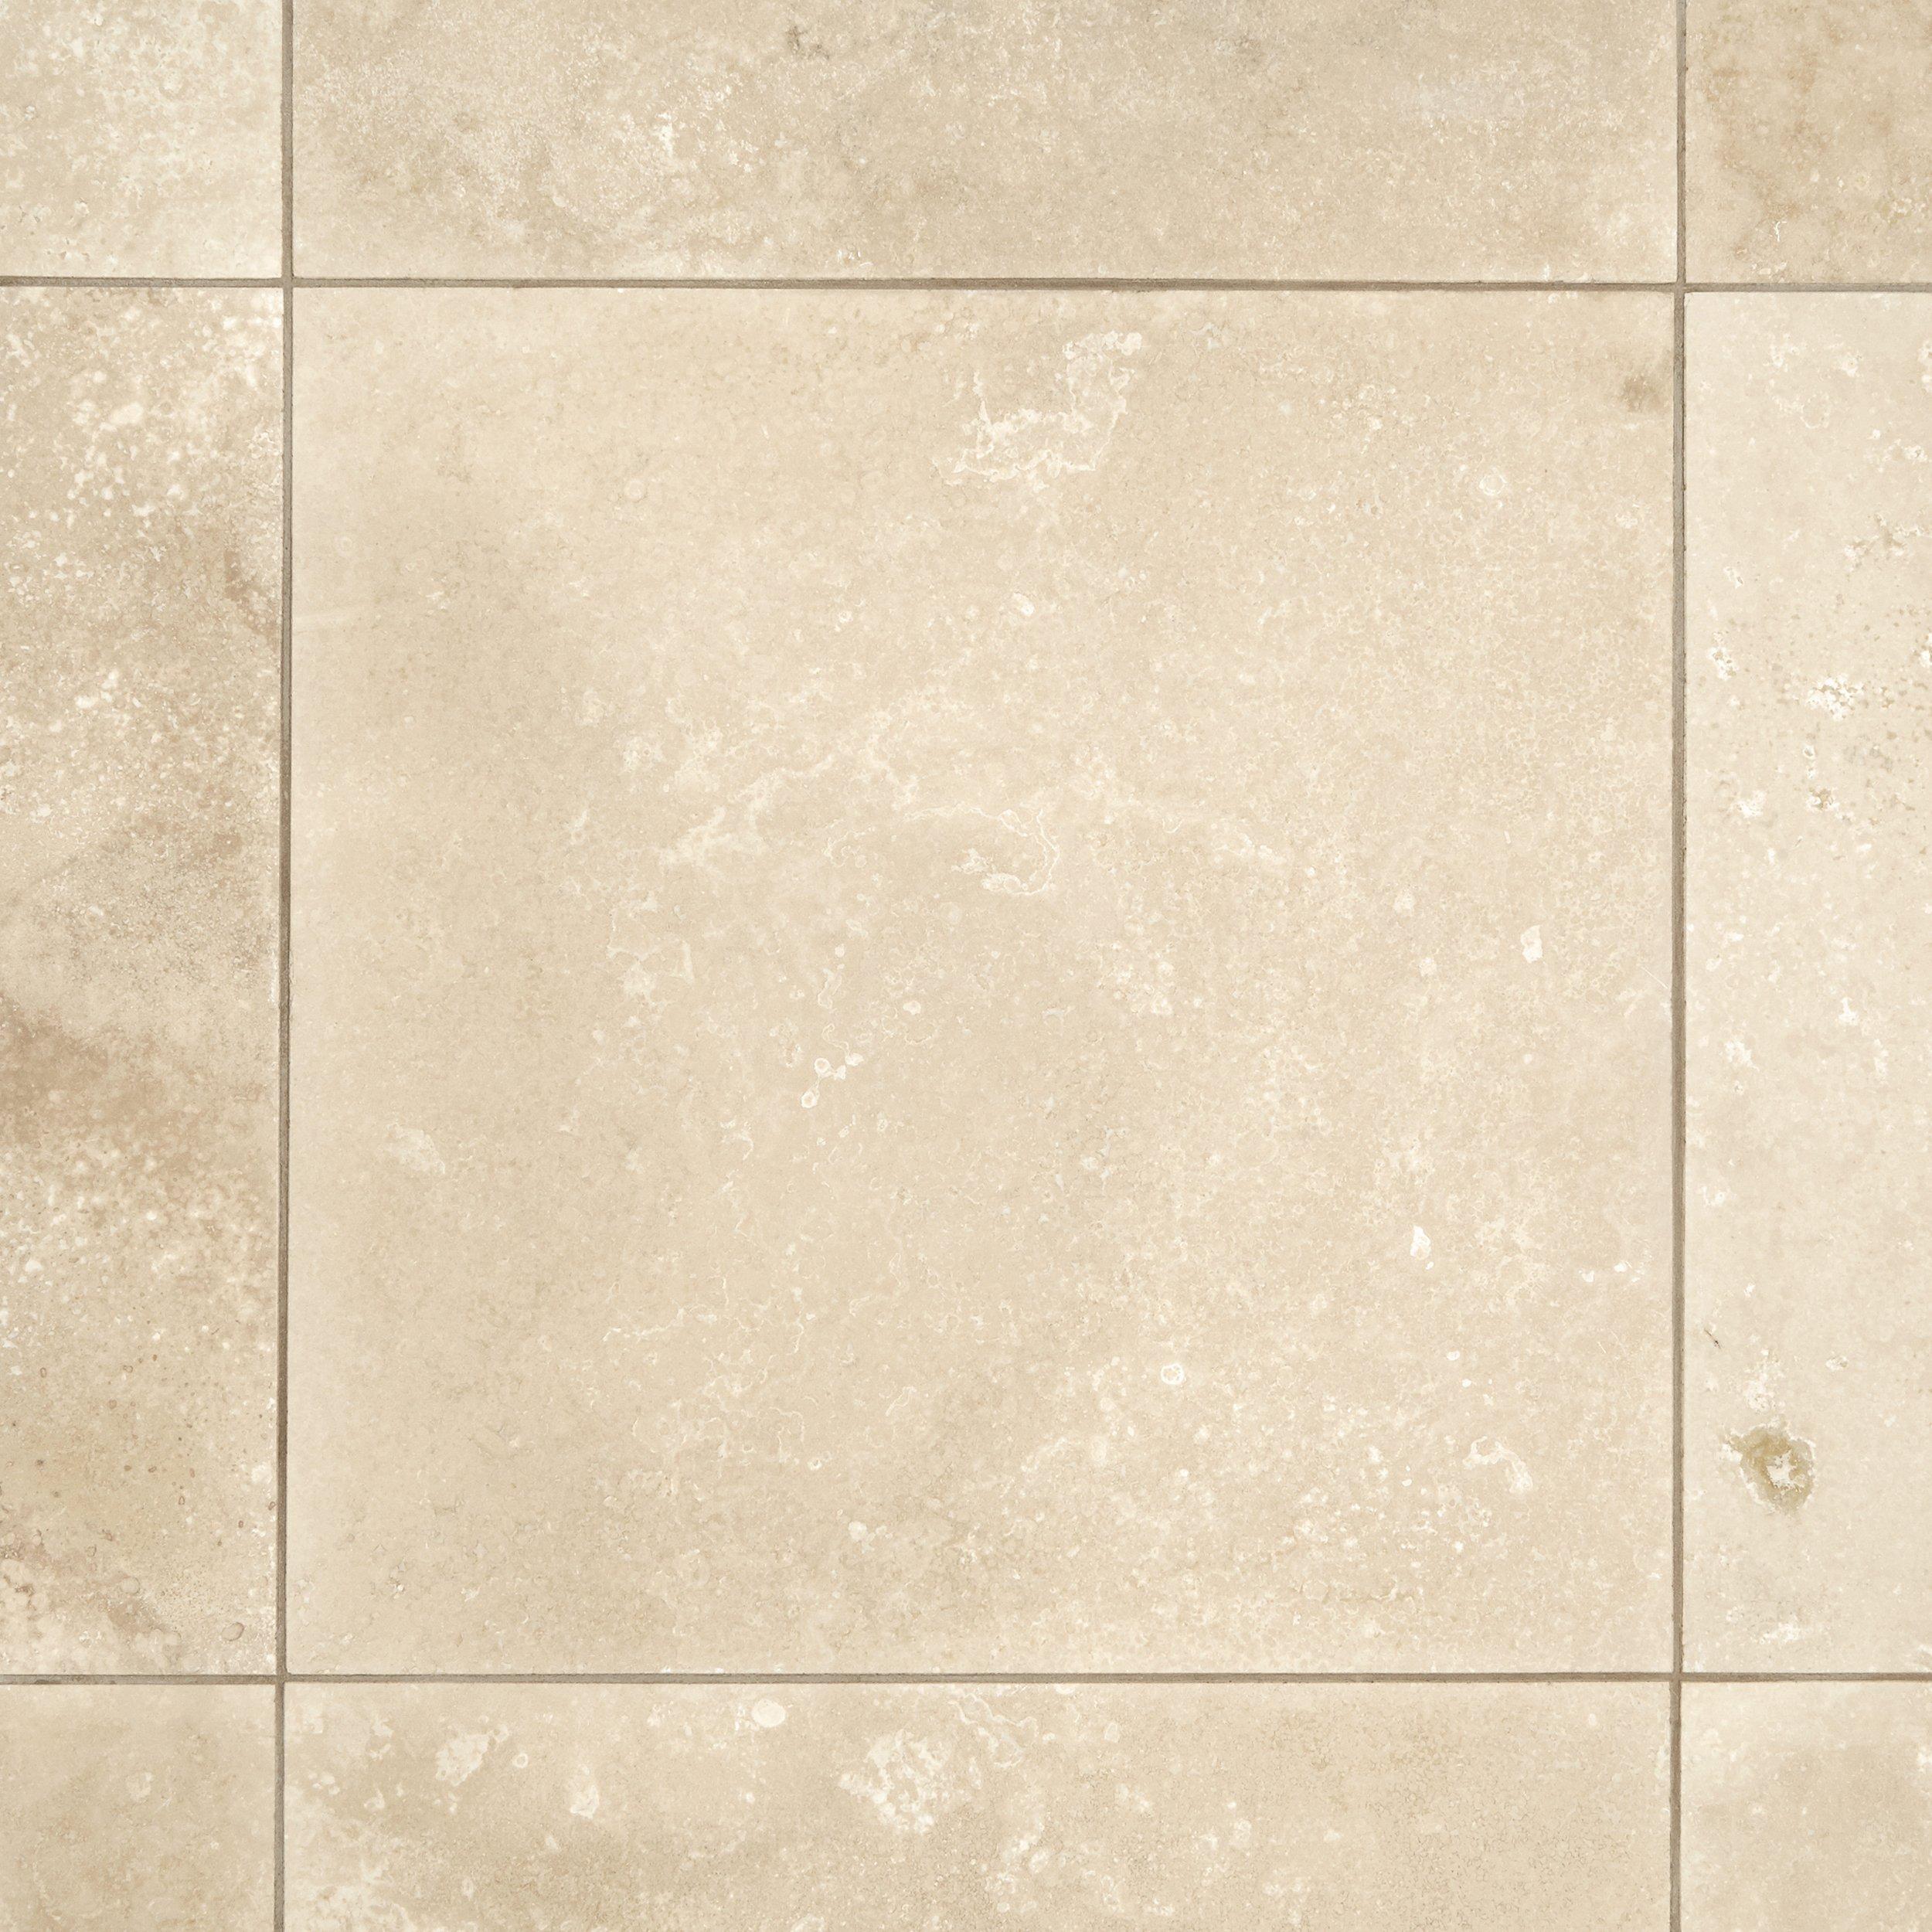 Cascade Commercial Travertine Tile 18 X 18 100061498